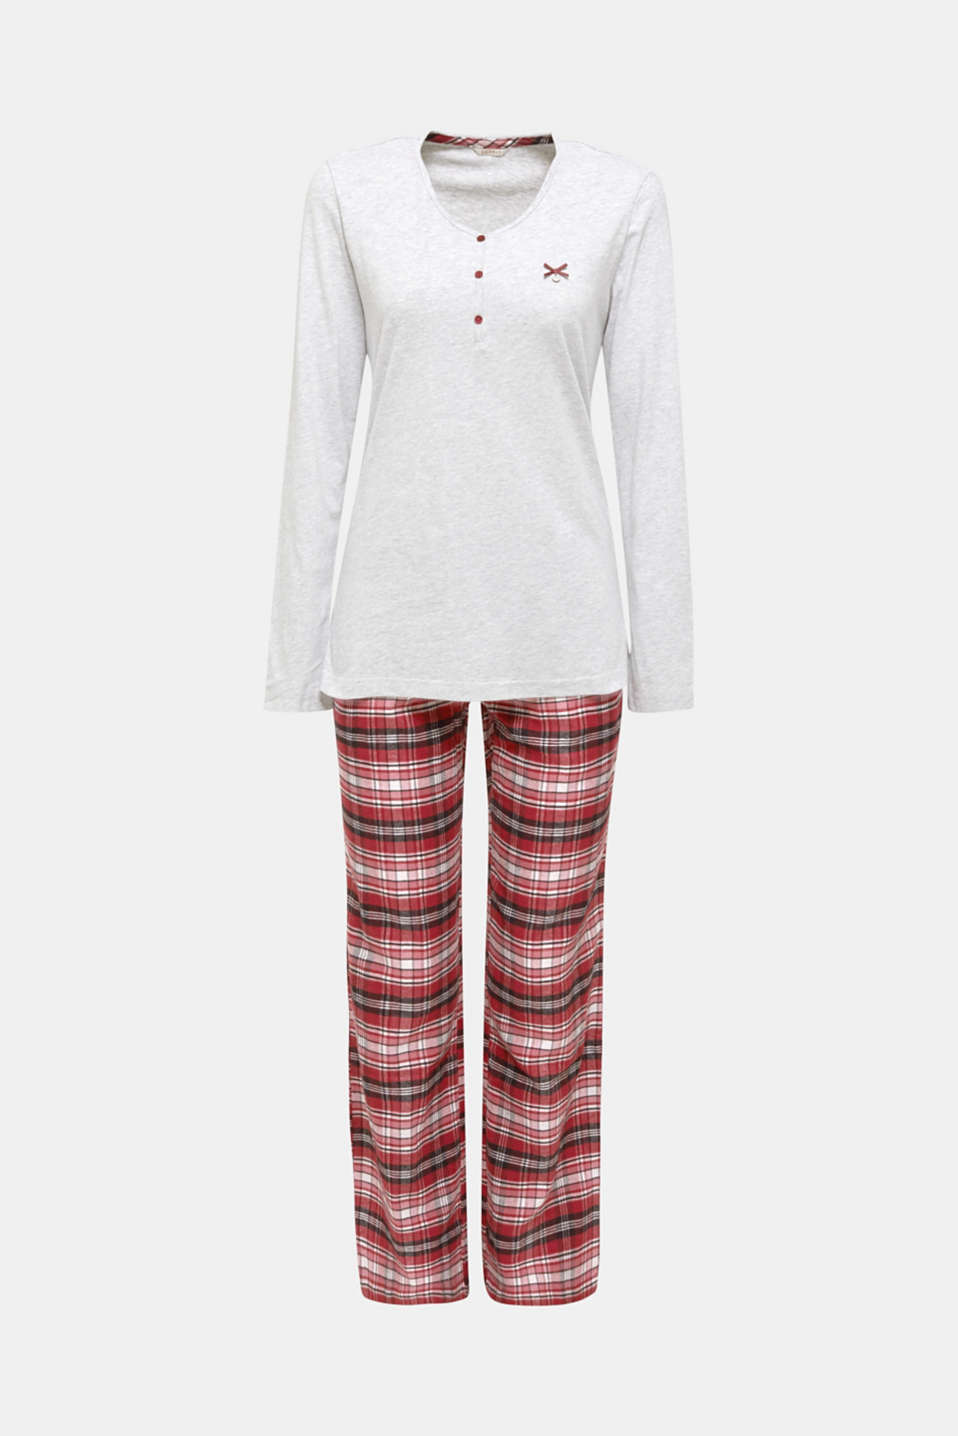 Jersey/flannel pyjamas, 100% cotton, DARK RED, detail image number 7